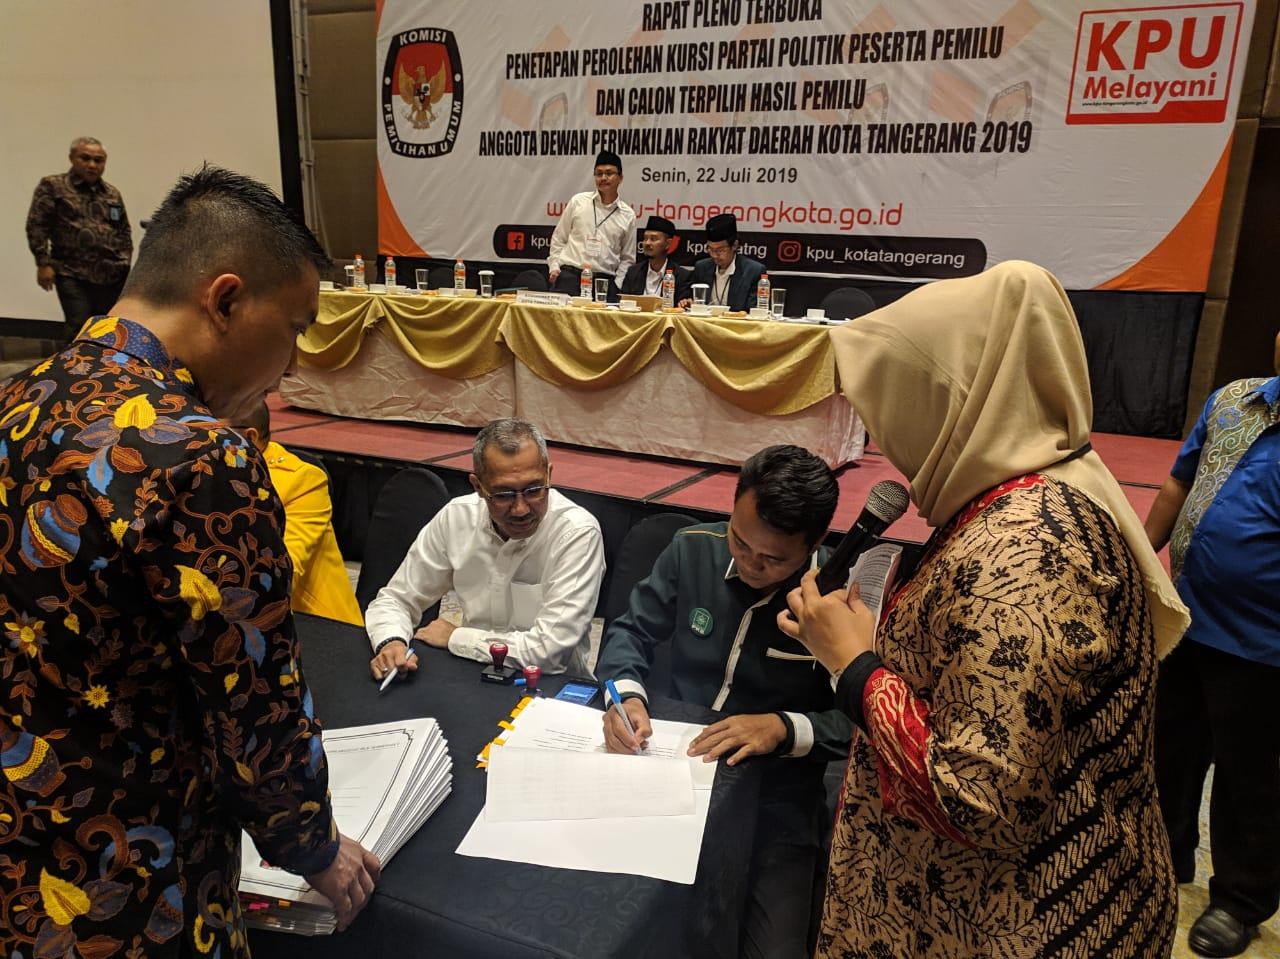 Nama-Nama Anggota DPRD Terpilih Kota Tangerang Hasil Pemilu 2019